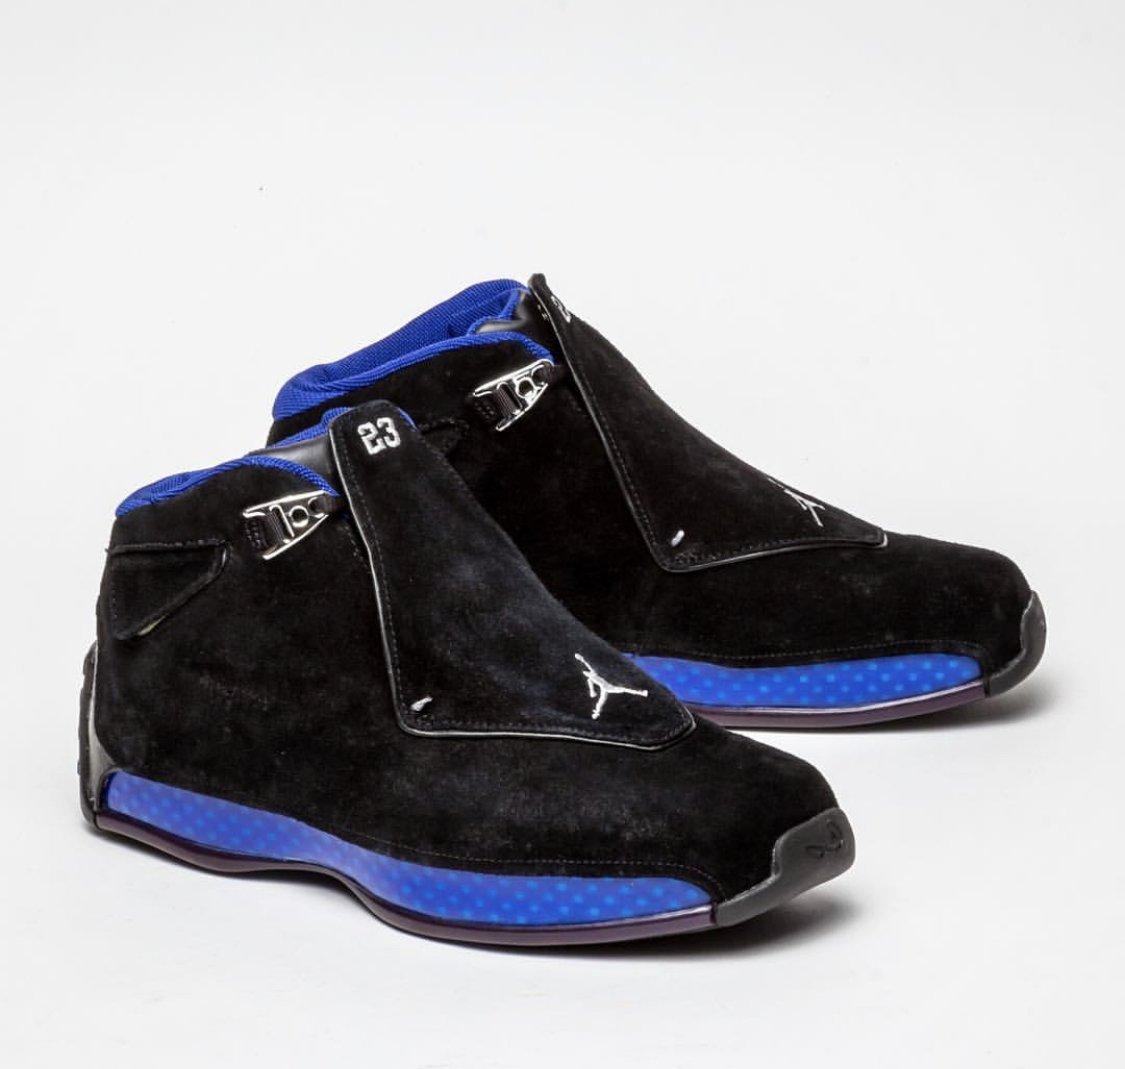 Sneaker Shouts™'s photo on Sport Royal